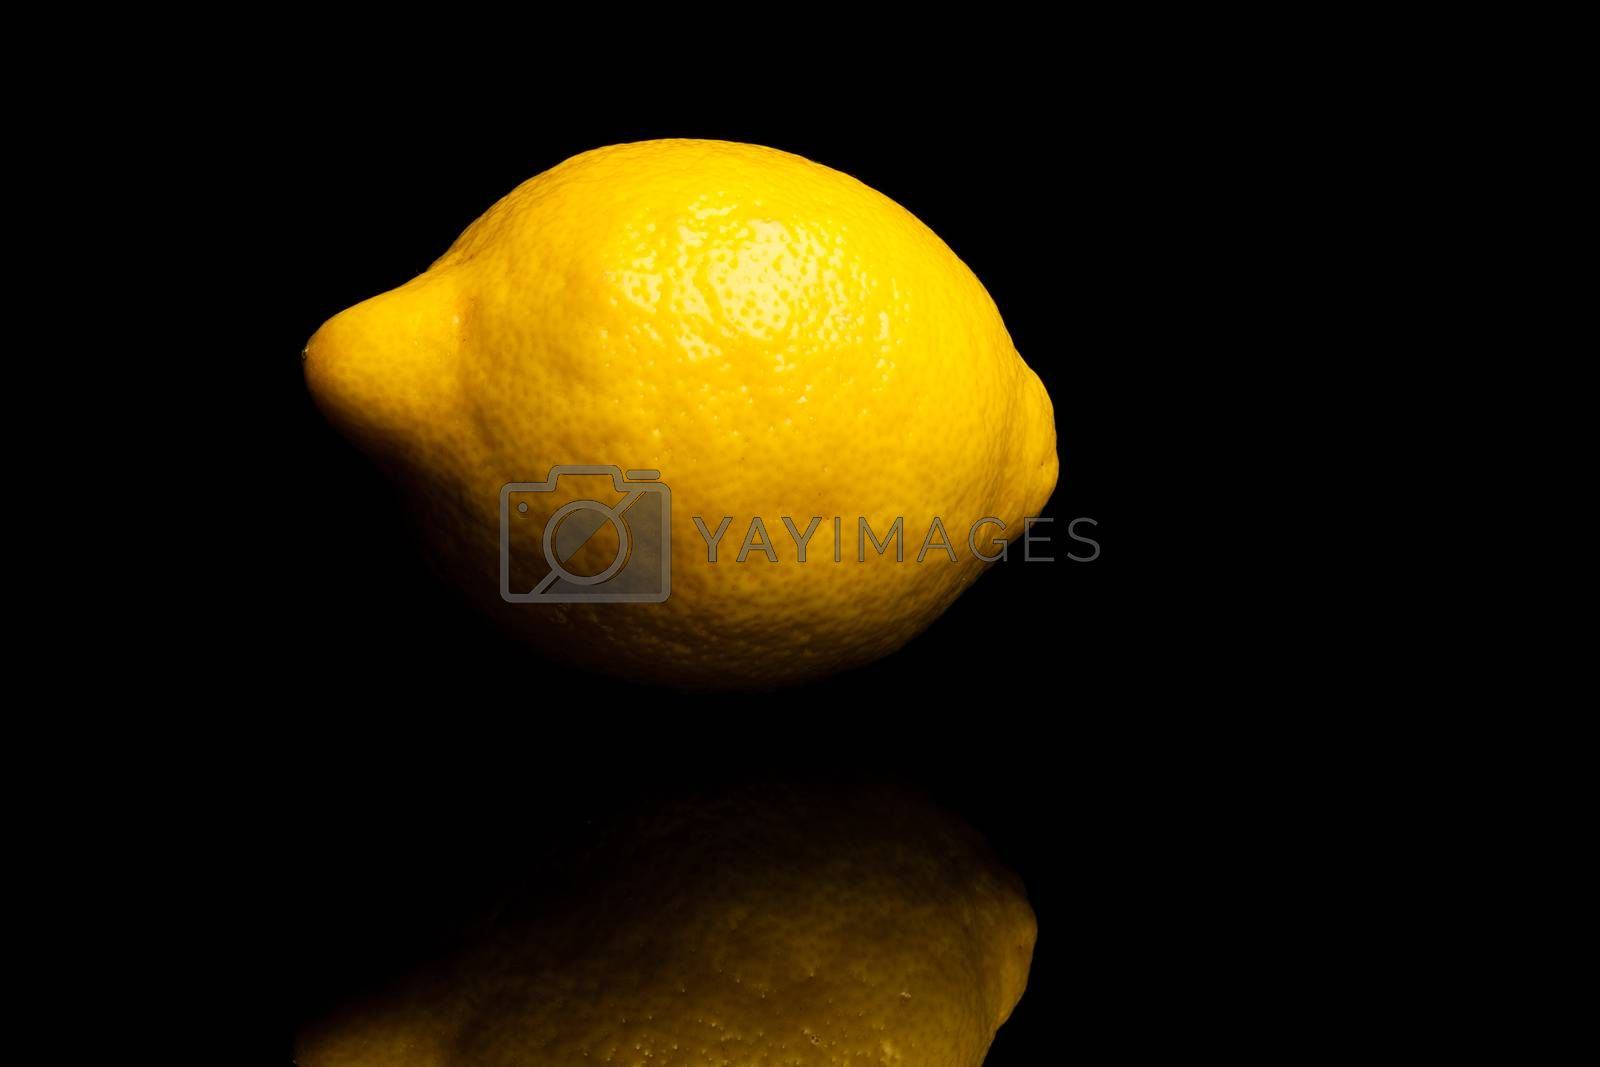 Royalty free image of Lemon by furo_felix